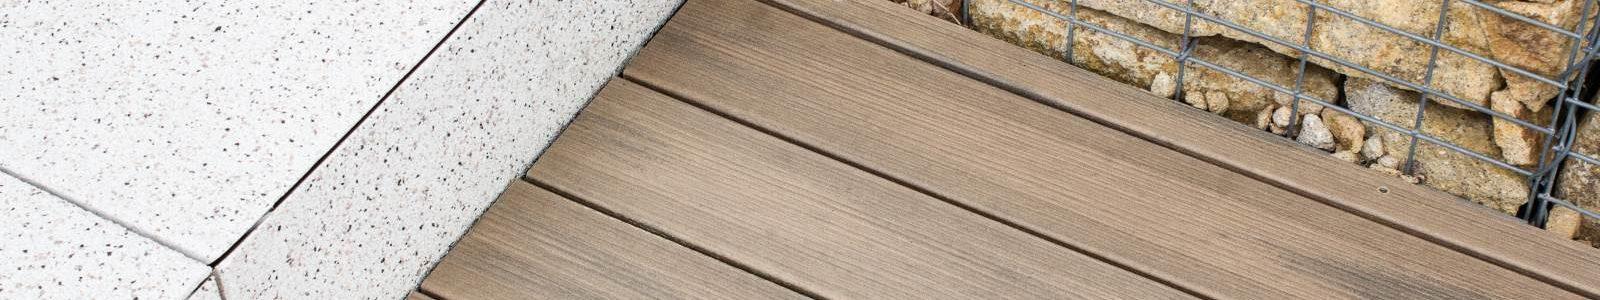 WoodPlastic® terasy forest plus teak